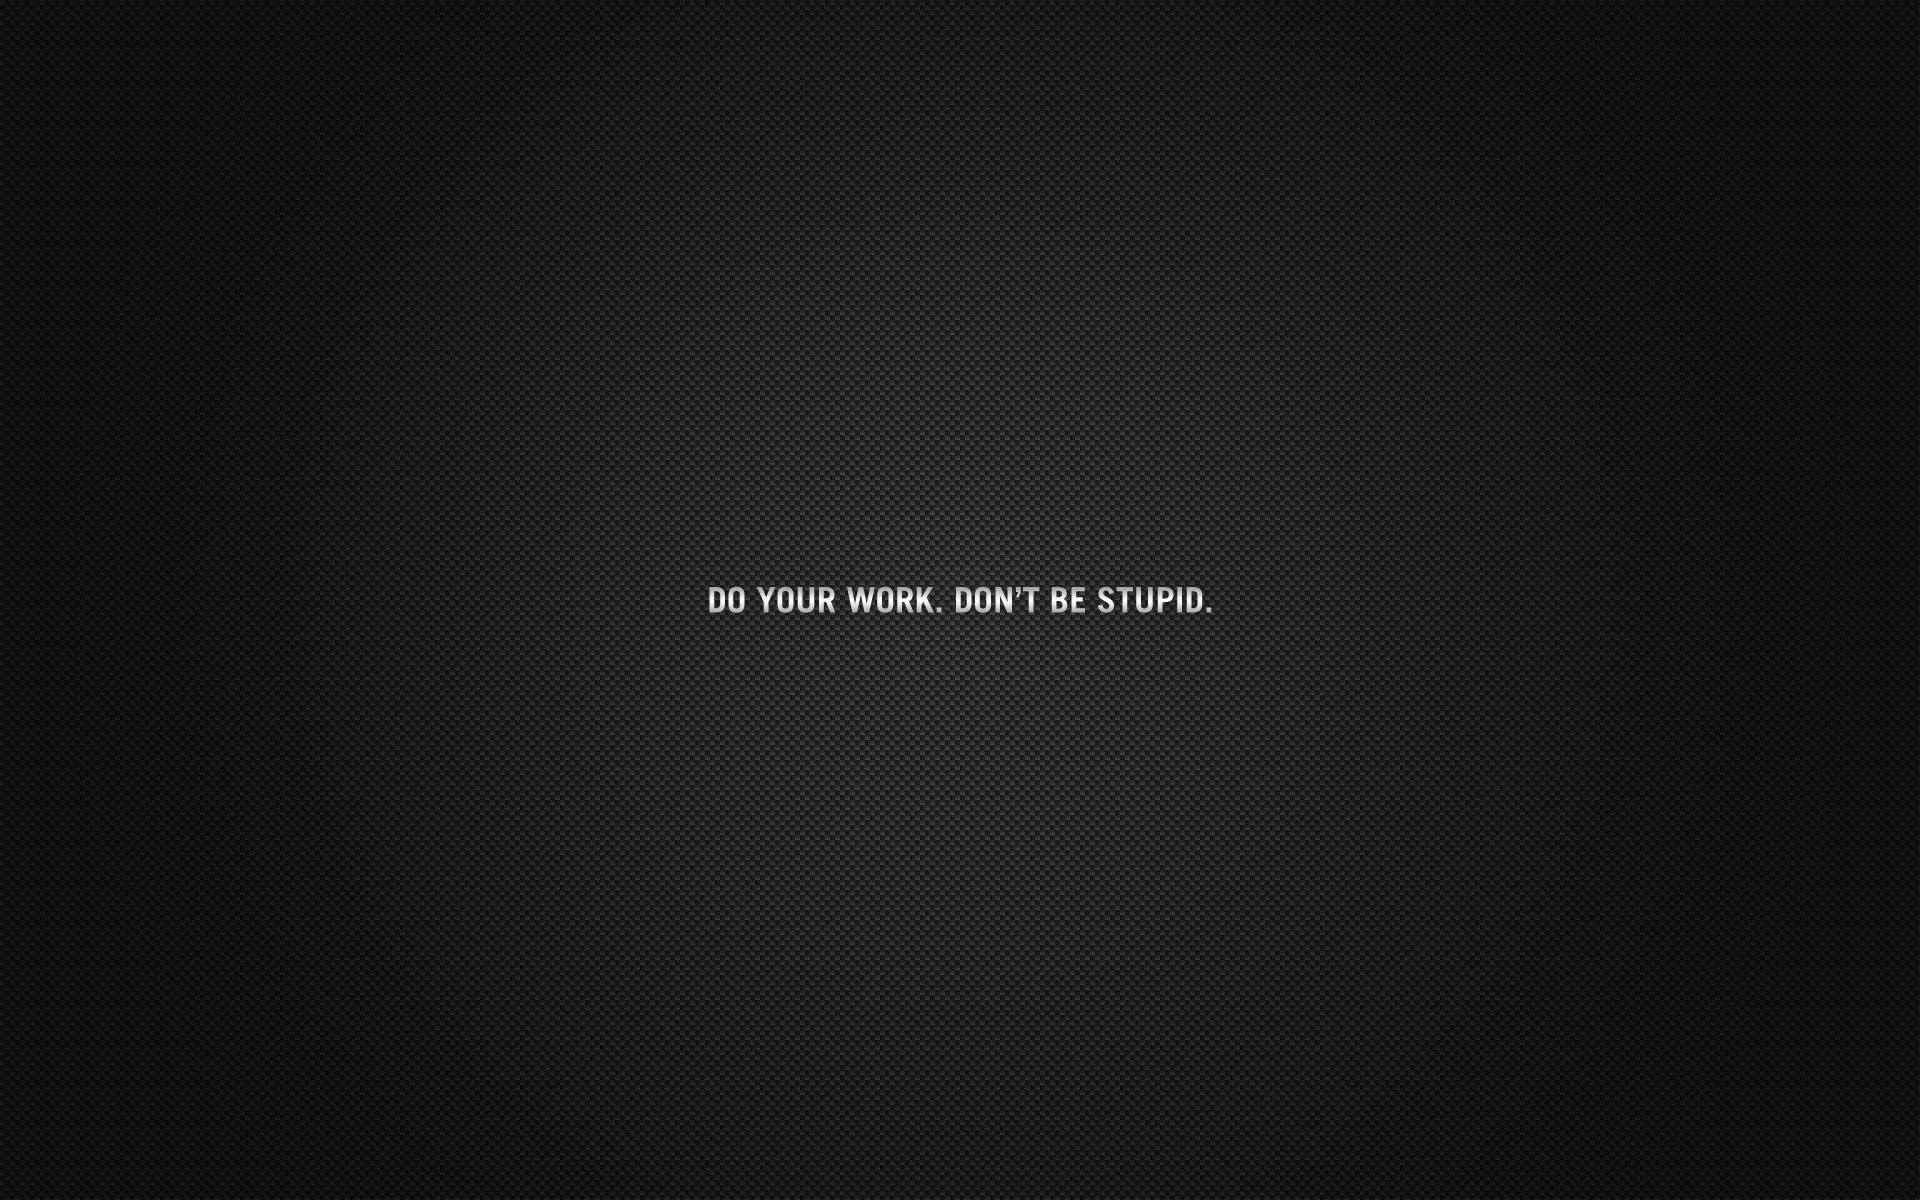 Inscription Cardboard Black Do Your Work Advice   Stock 1920x1200